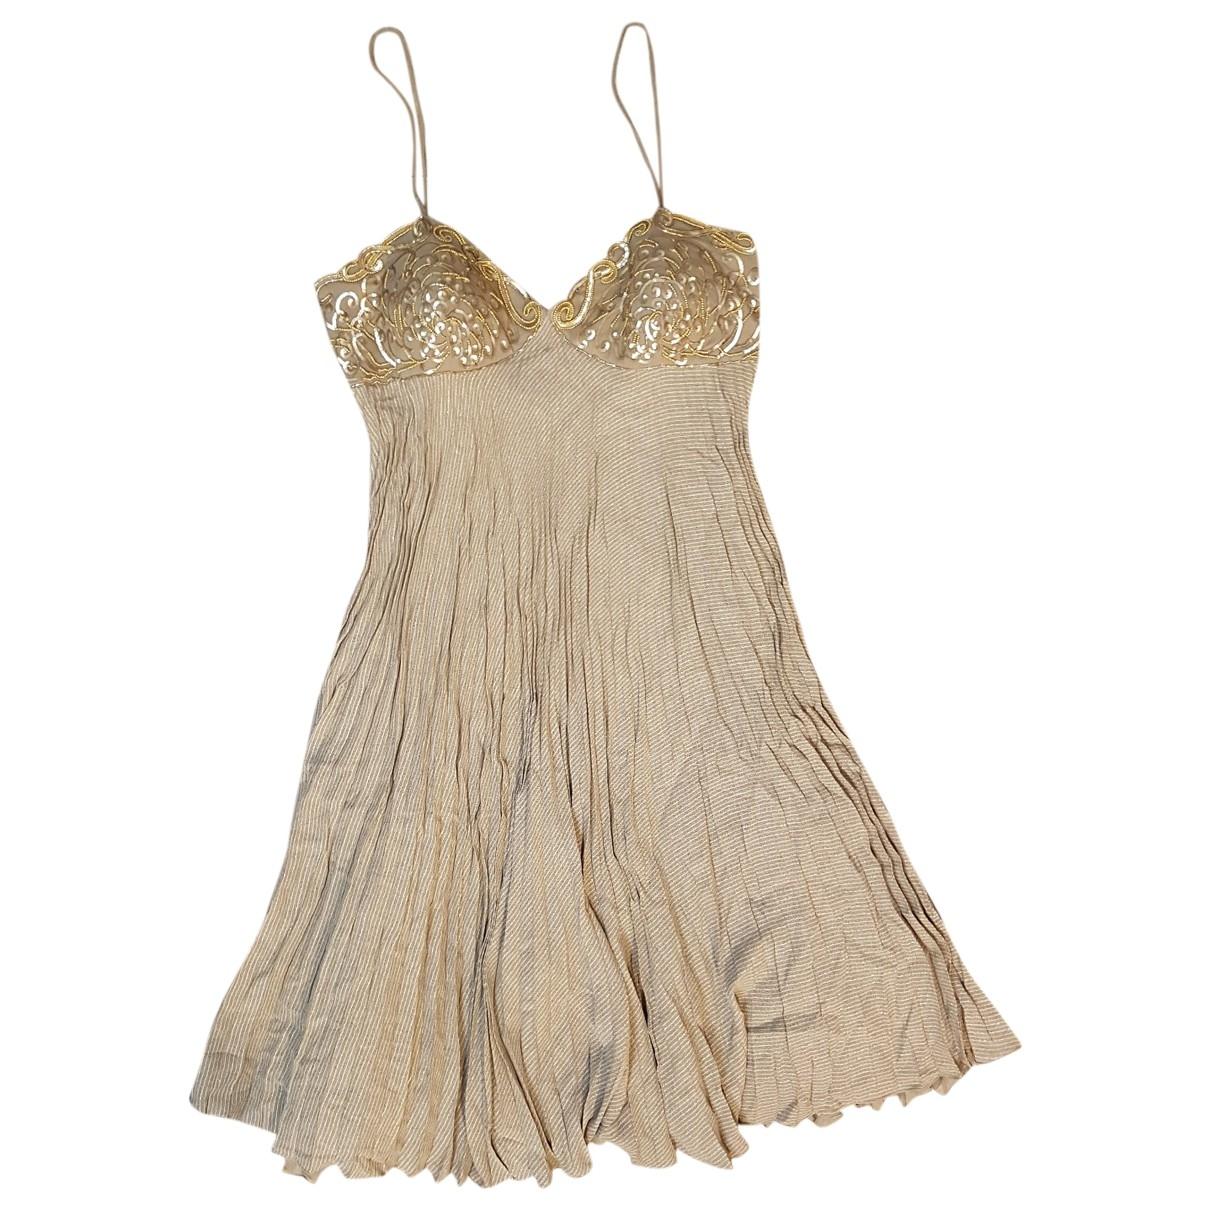 Valentino Garavani \N Beige dress for Women 44 FR